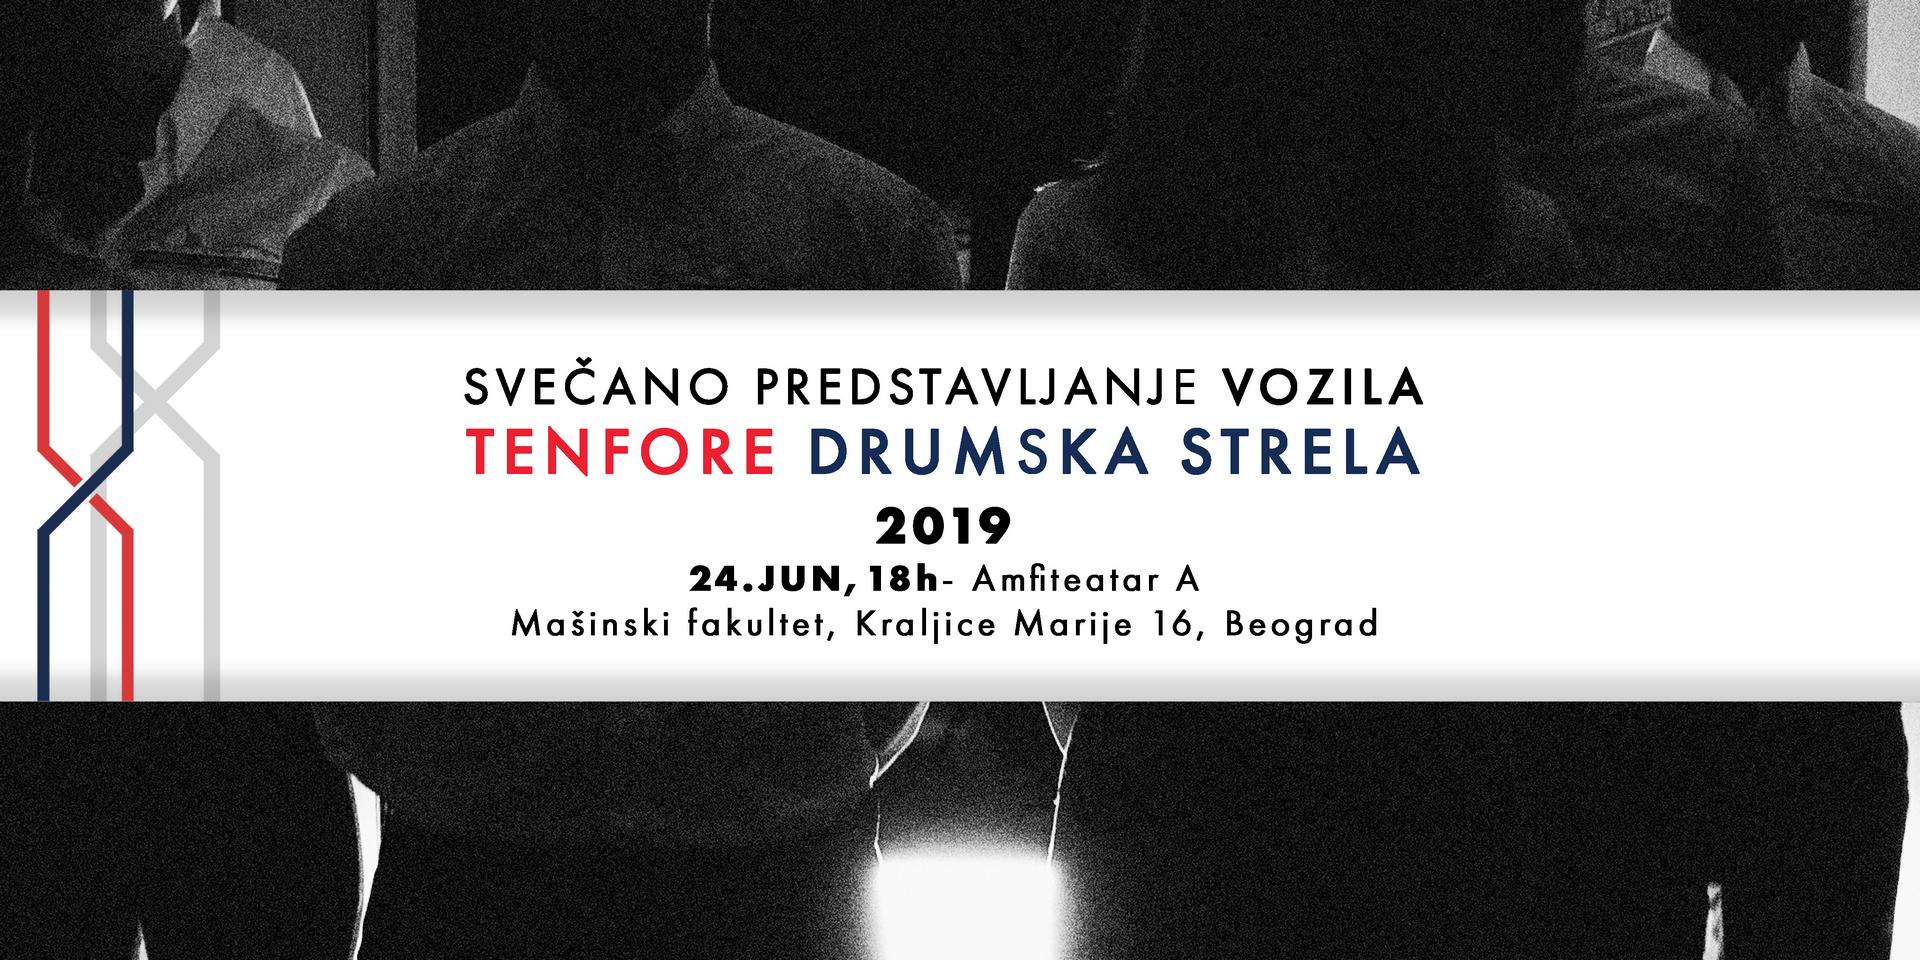 poziv na predstavljanje novog vozila drumske strele 2019, fsra2019